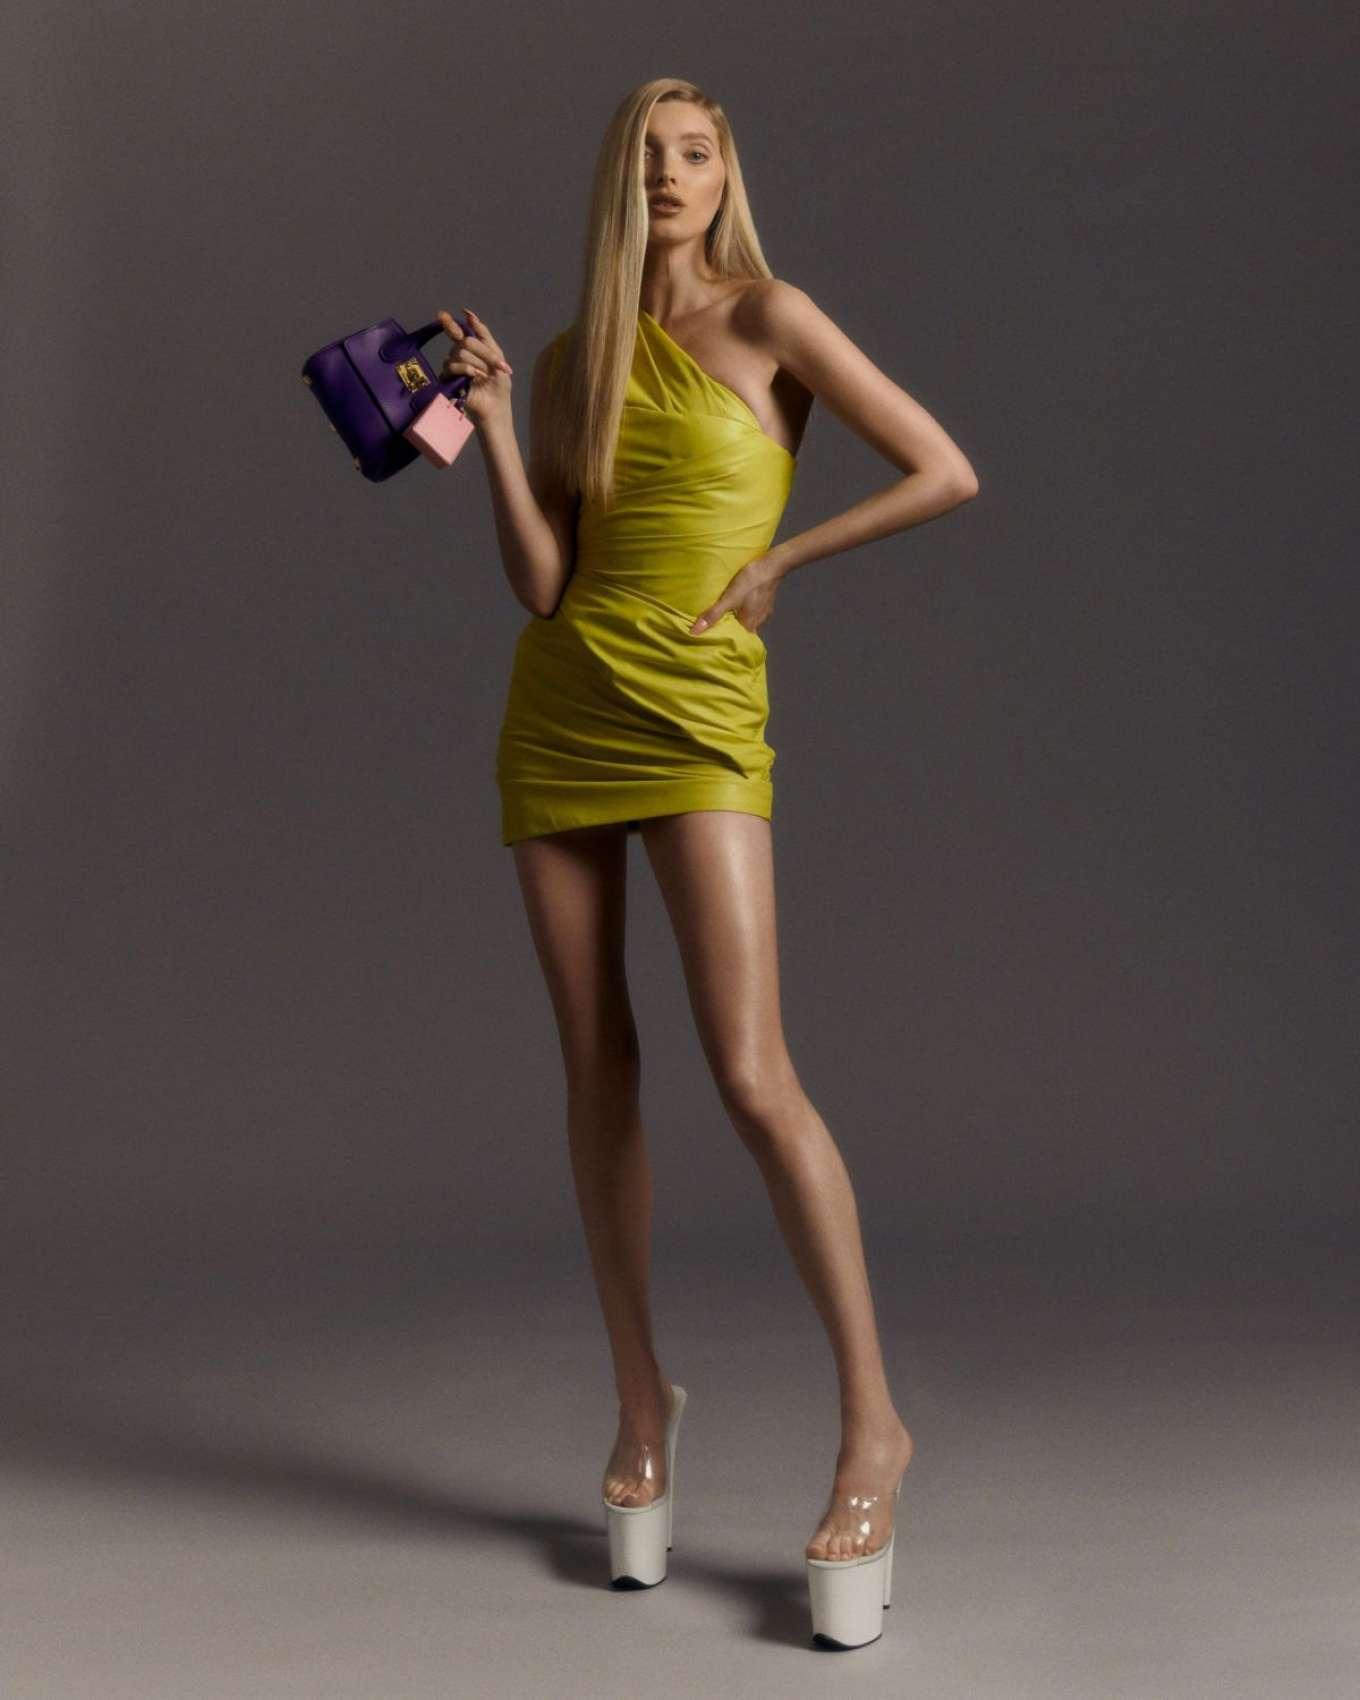 Elsa Hosk - Big Fashion CR 2019 Photoshoot